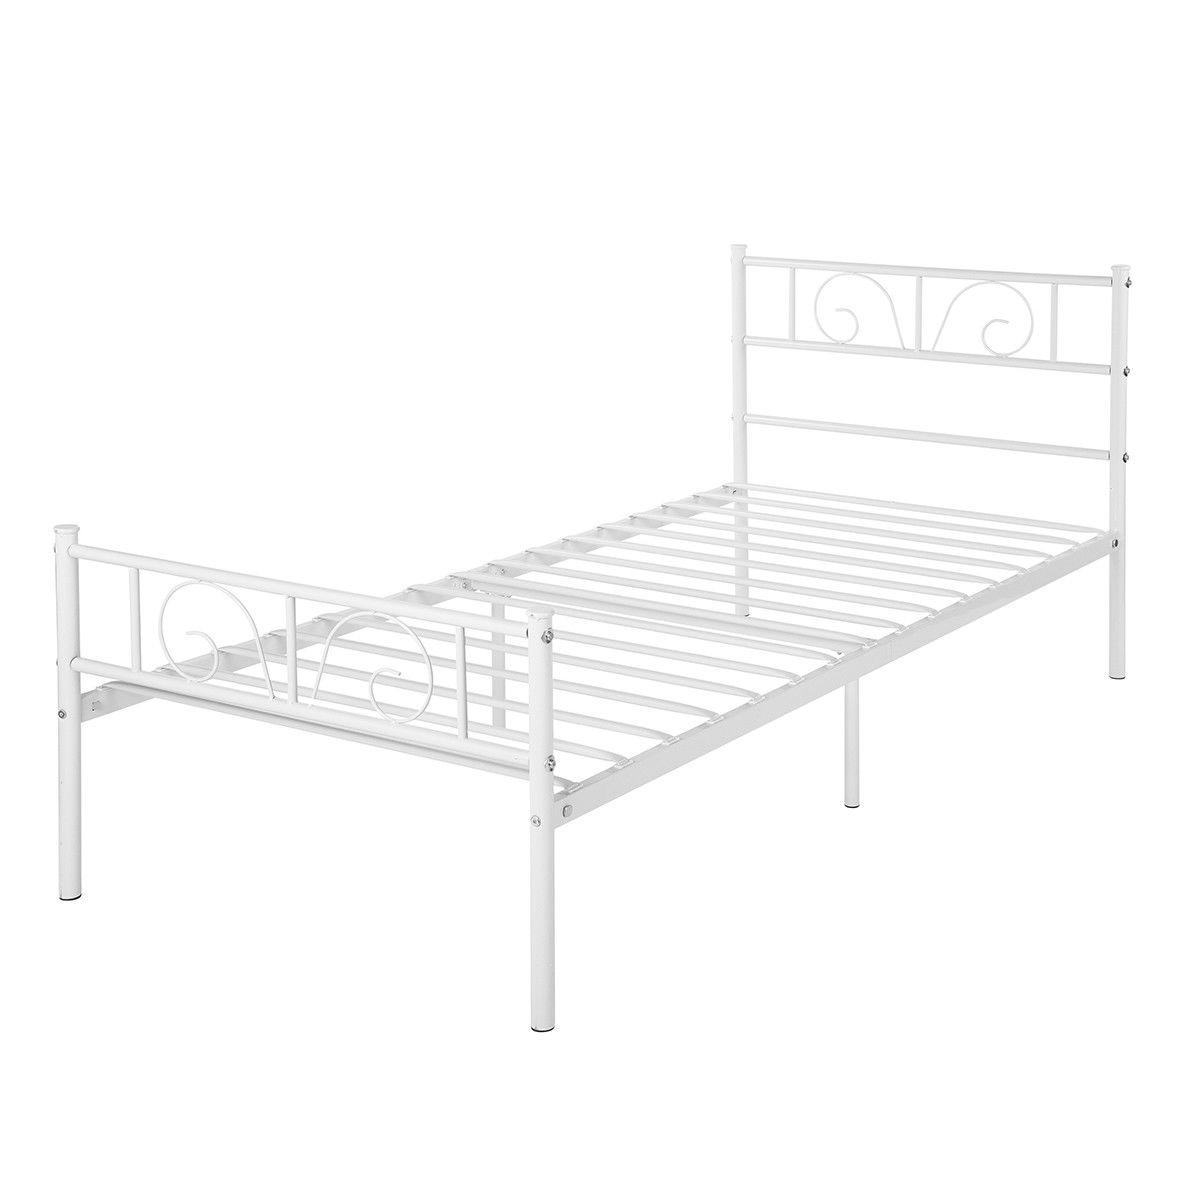 Twin Size Bed Headboards Furniture Legs